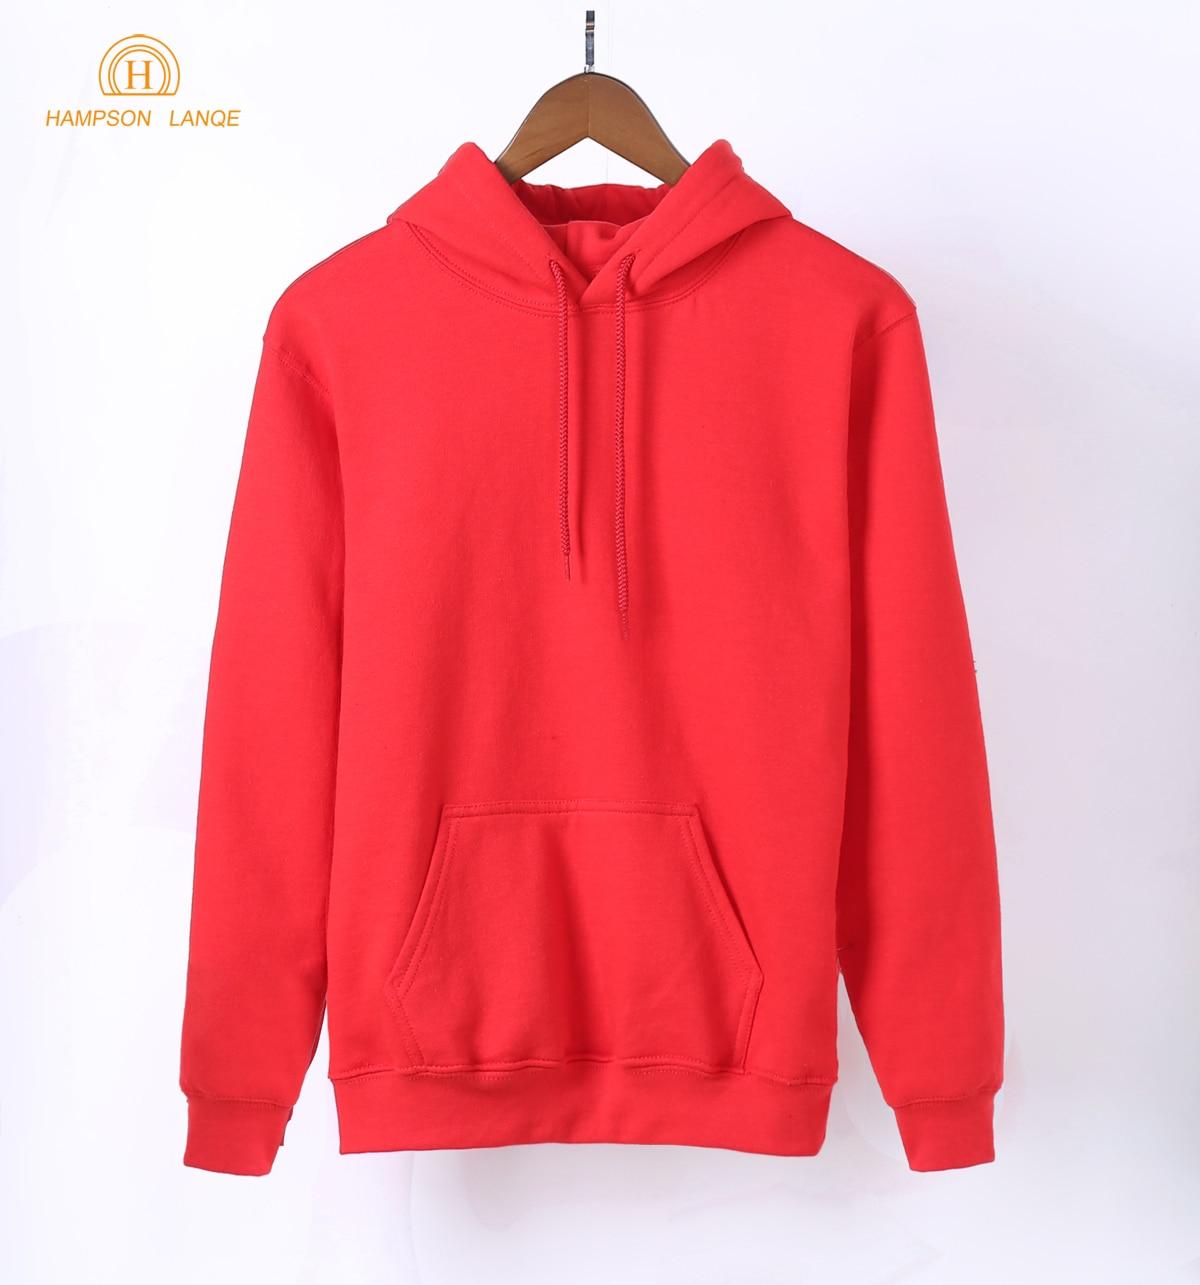 HTB18bP3oHYI8KJjy0Faq6zAiVXaq - 2018 New Arrival Spring Kawaii Women Sweatshirts Kpop Solid Hoodies Warm Fleece Harajuku Hoodie Black White Gray Pink Red Blue